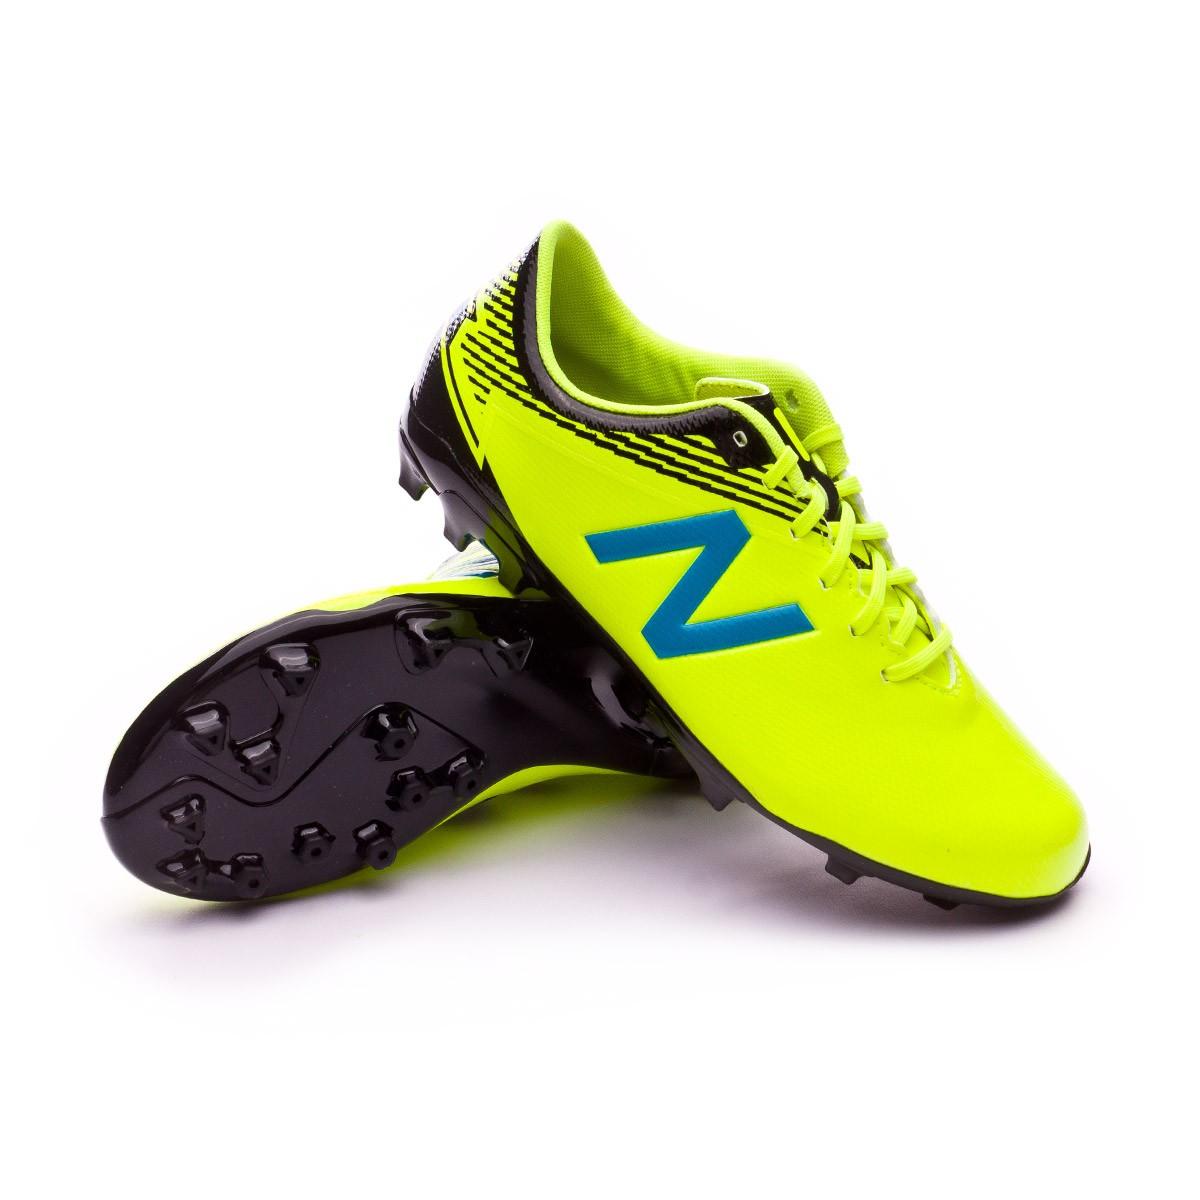 1a4b9b852aa91 Football Boots New Balance Kids Furon Dispatch AG Amarillo Fluor ...